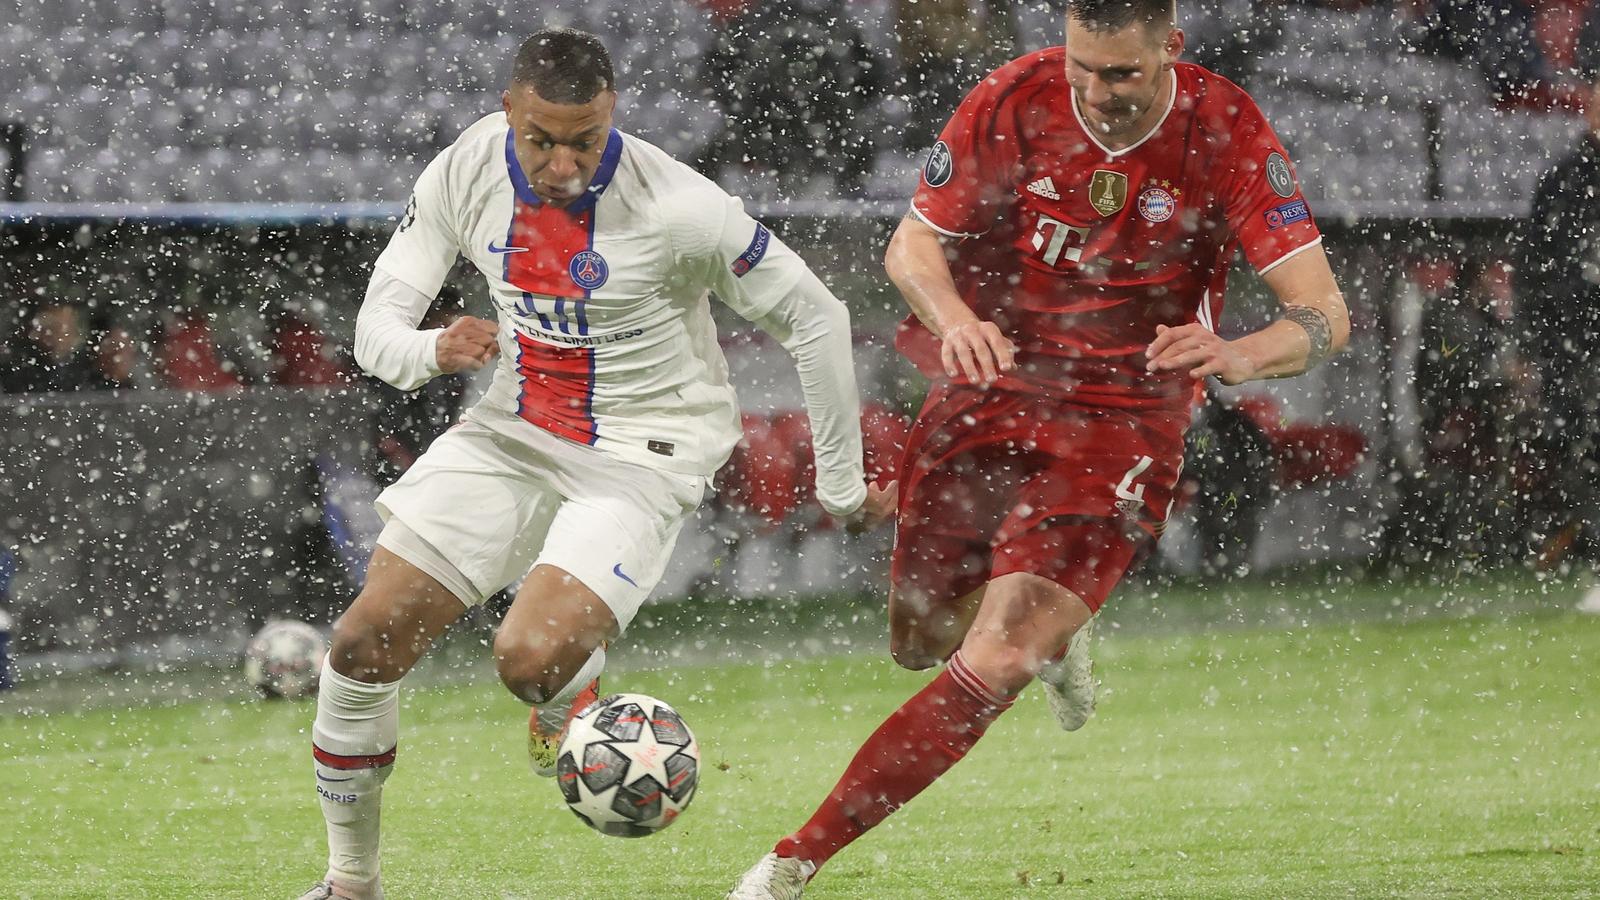 Advantage PSG after five-goal classic in Munich